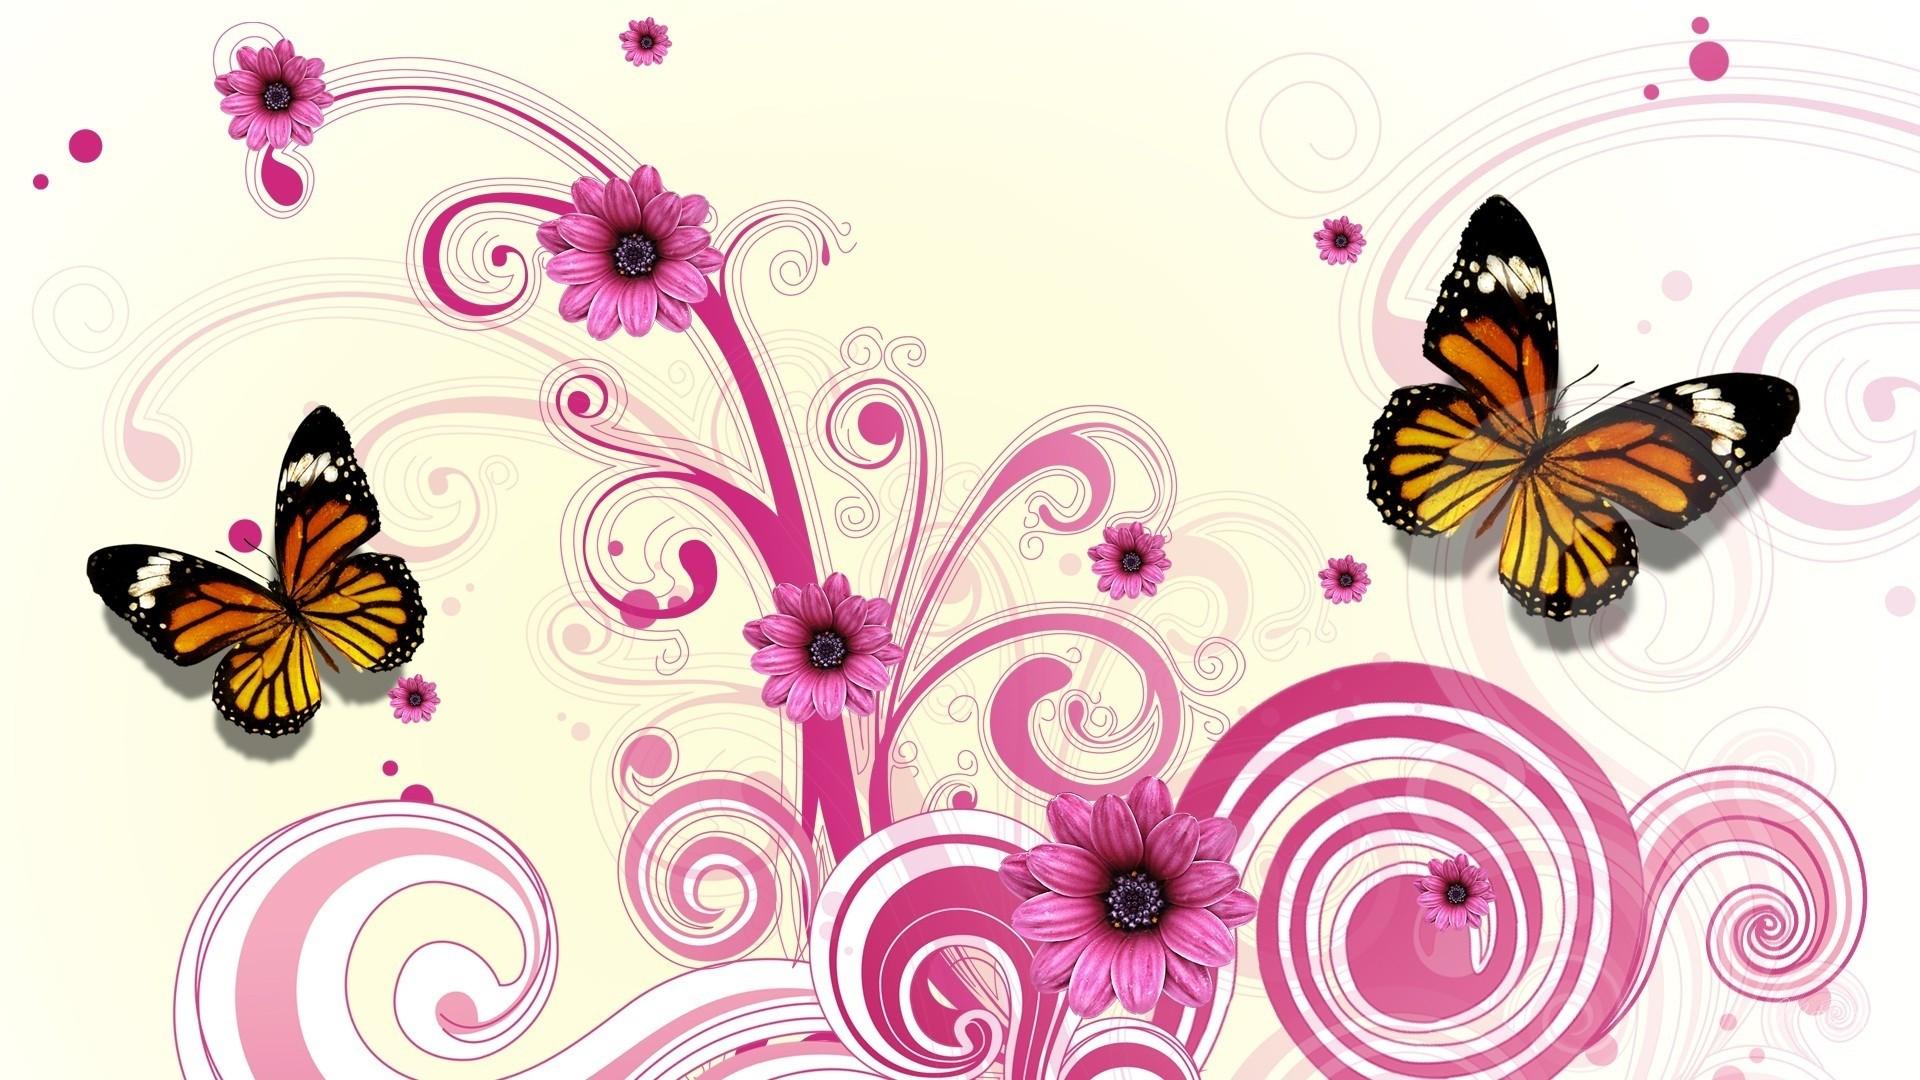 Pink Butterfly wallpaper photo hd